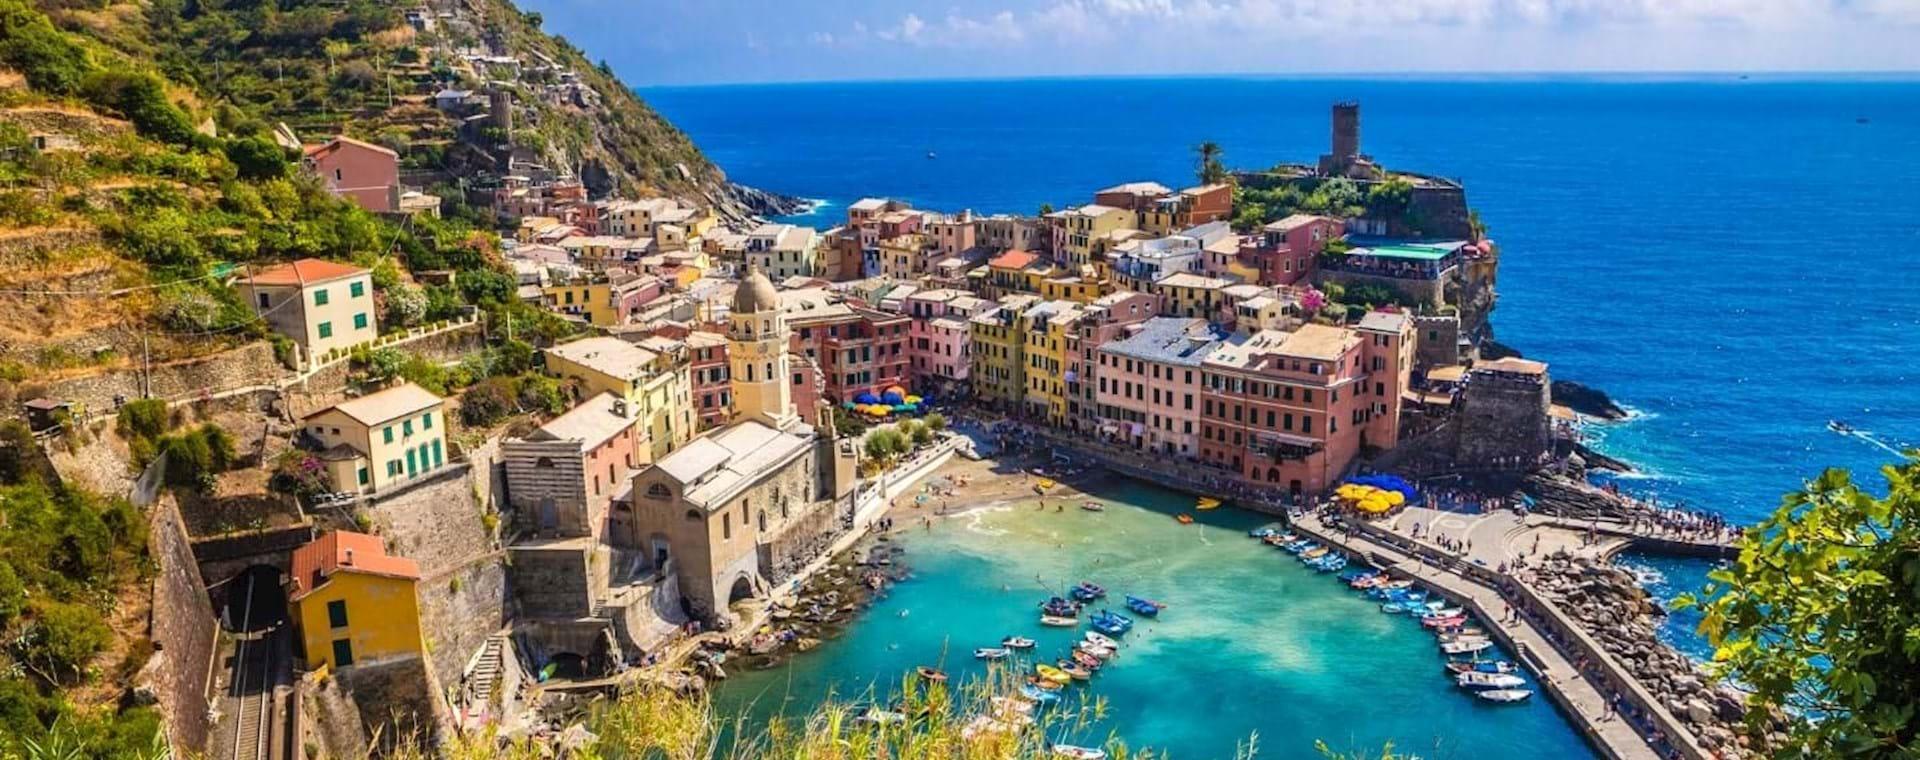 Day Trip: Cinque Terre & Portovenere from Milan